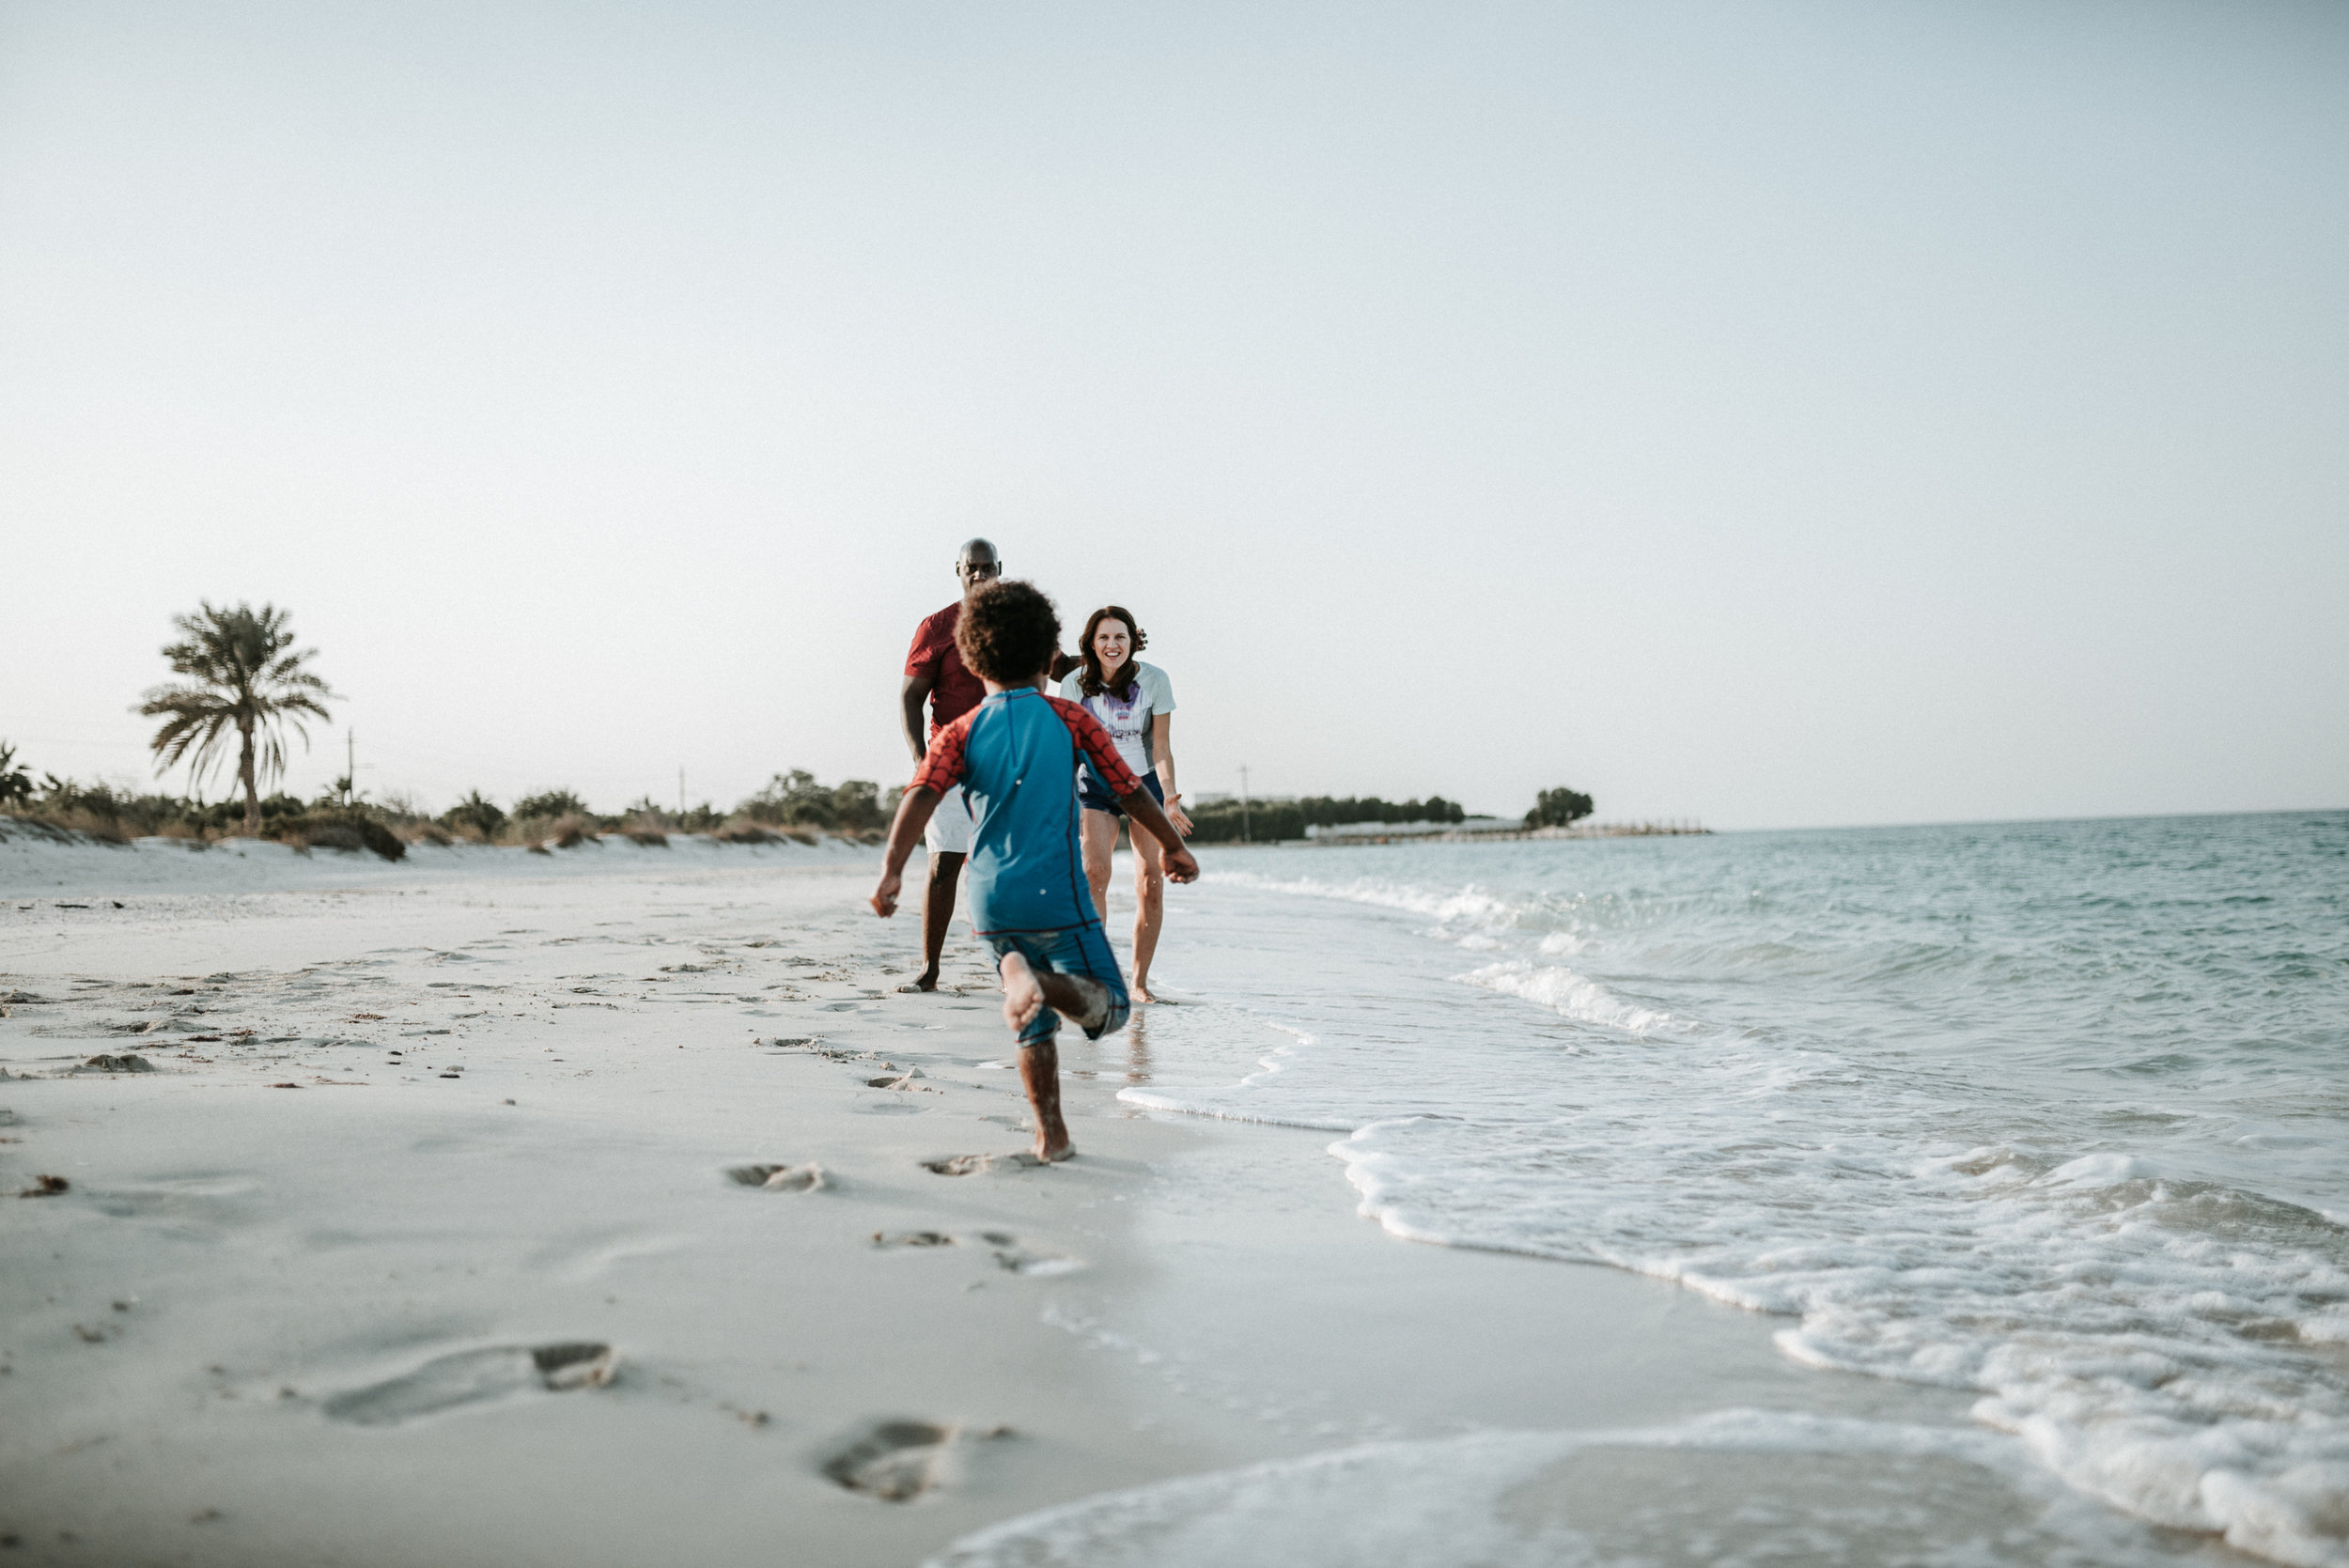 Saudi Arabia Family photographer, Saudi photographer, Bahrain photographer, bahrain family photographer, houston family photographer, lifestyle photographer, Saudi lifestyle photographer, bahrain lifestyle photographer,